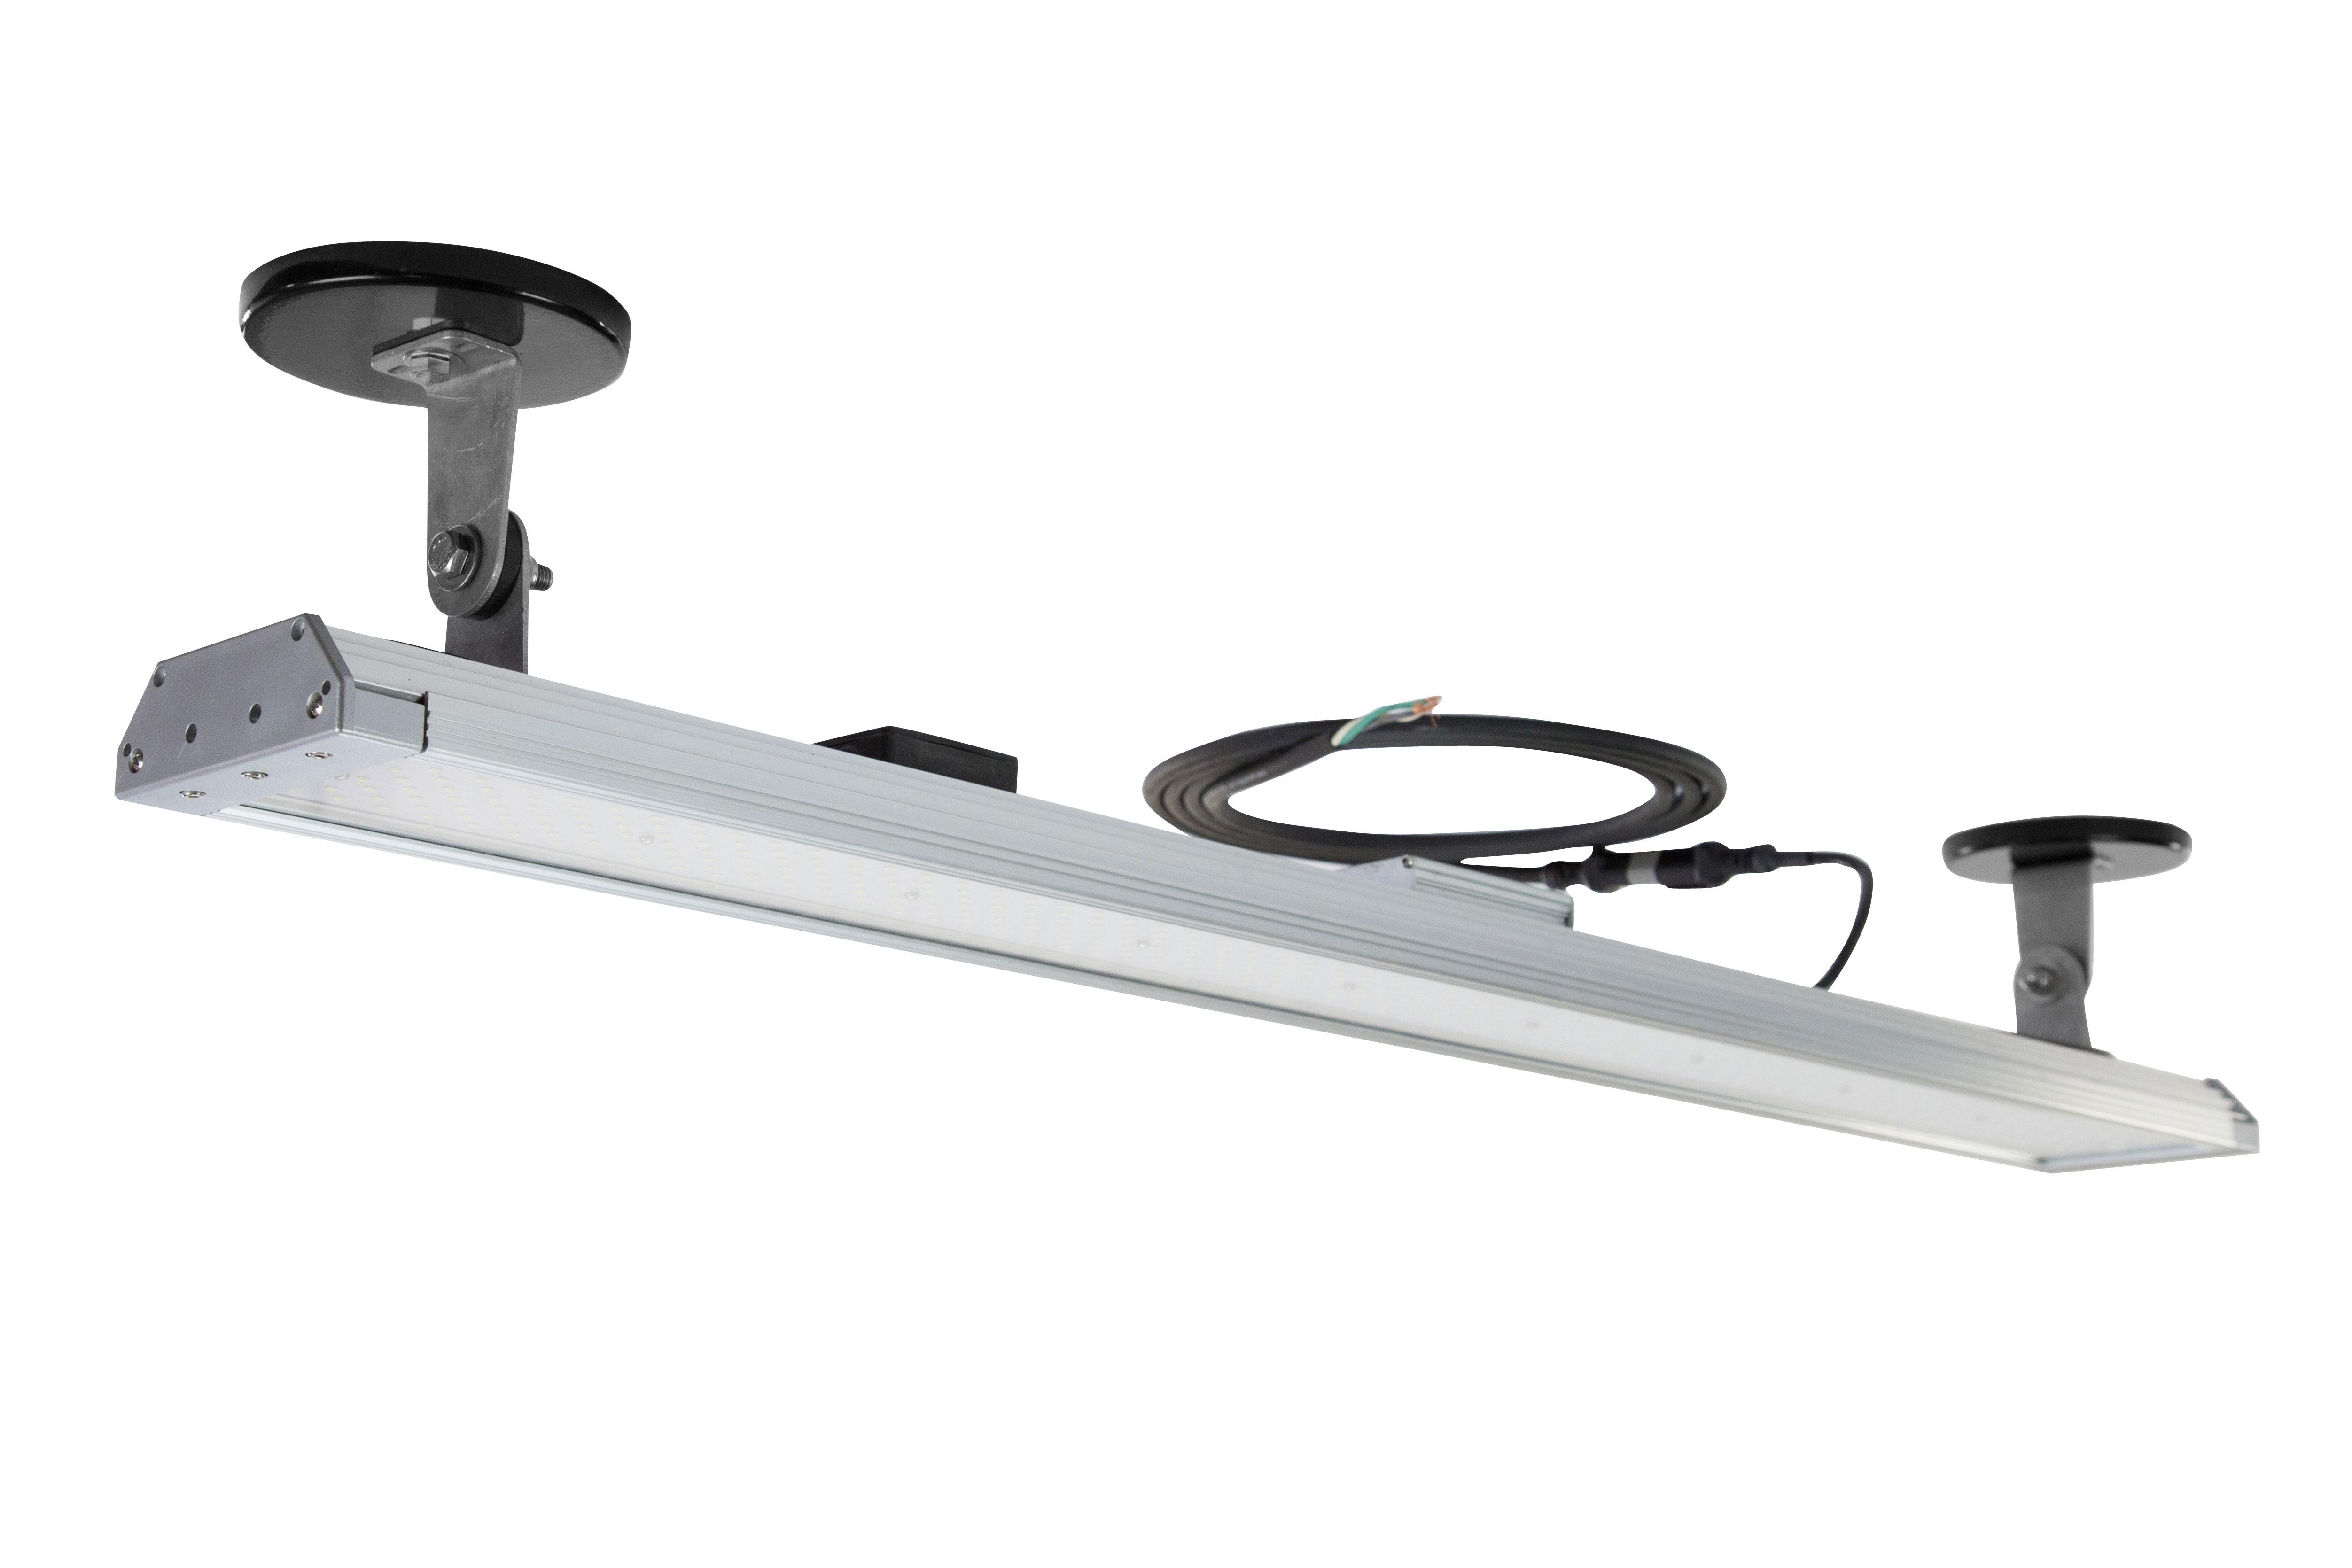 Larson Electronics Releases 160 Watt Magnetic Mount Led